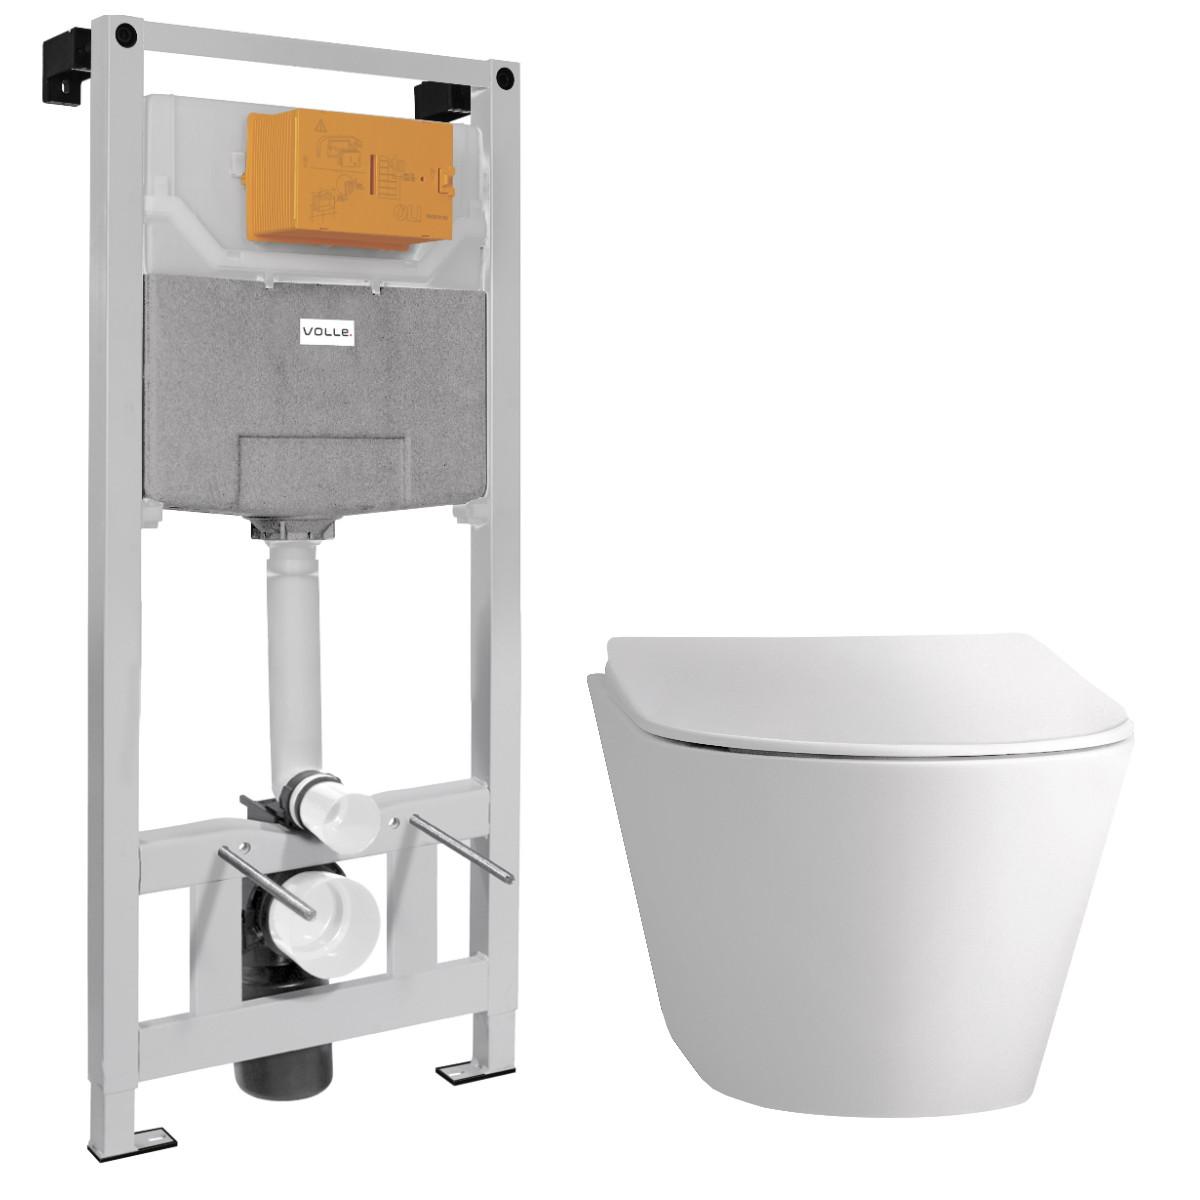 Комплект: AIVA Rimless унитаз, сиденье SLIM+VOLLE MASTER NEO инсталляция для подвесного унитаза без клавиши